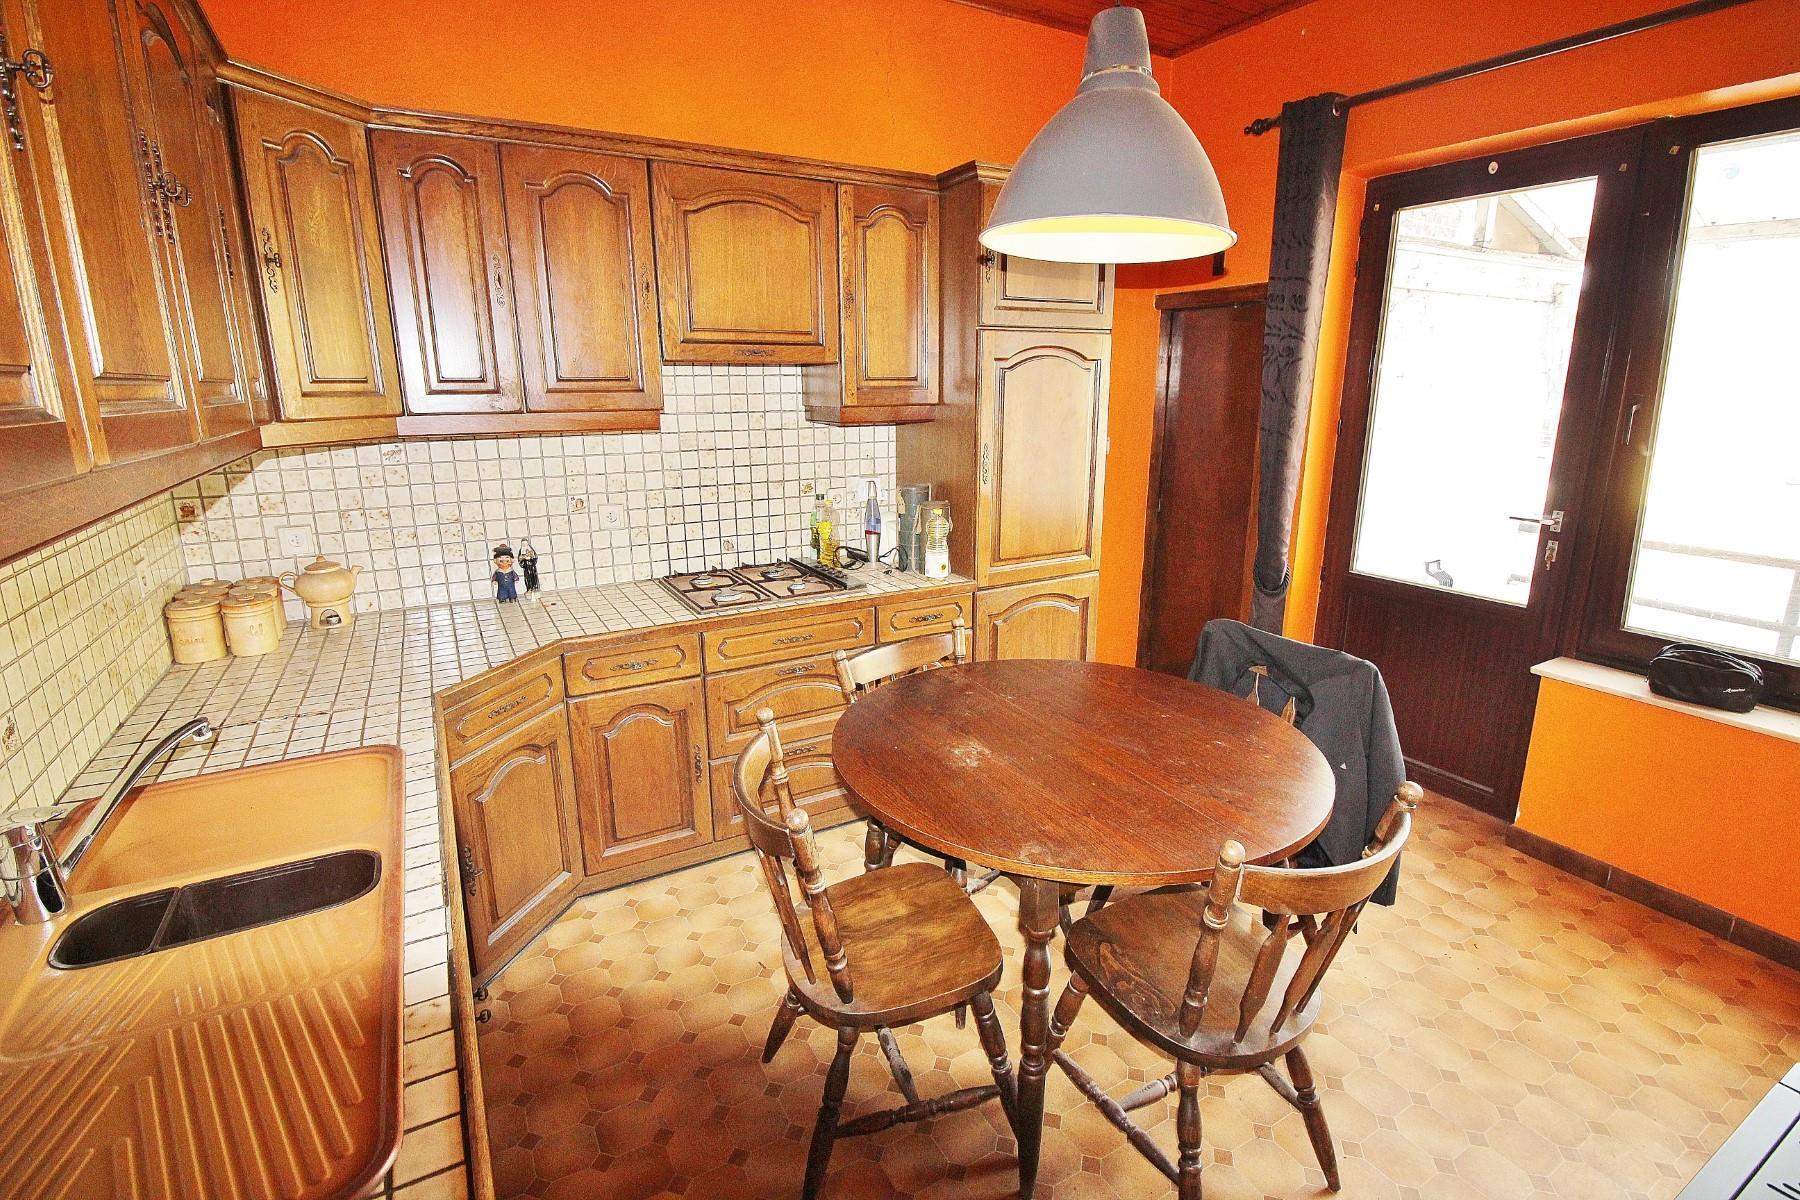 Maison - Seraing Jemeppesur-Meuse - #3539725-4